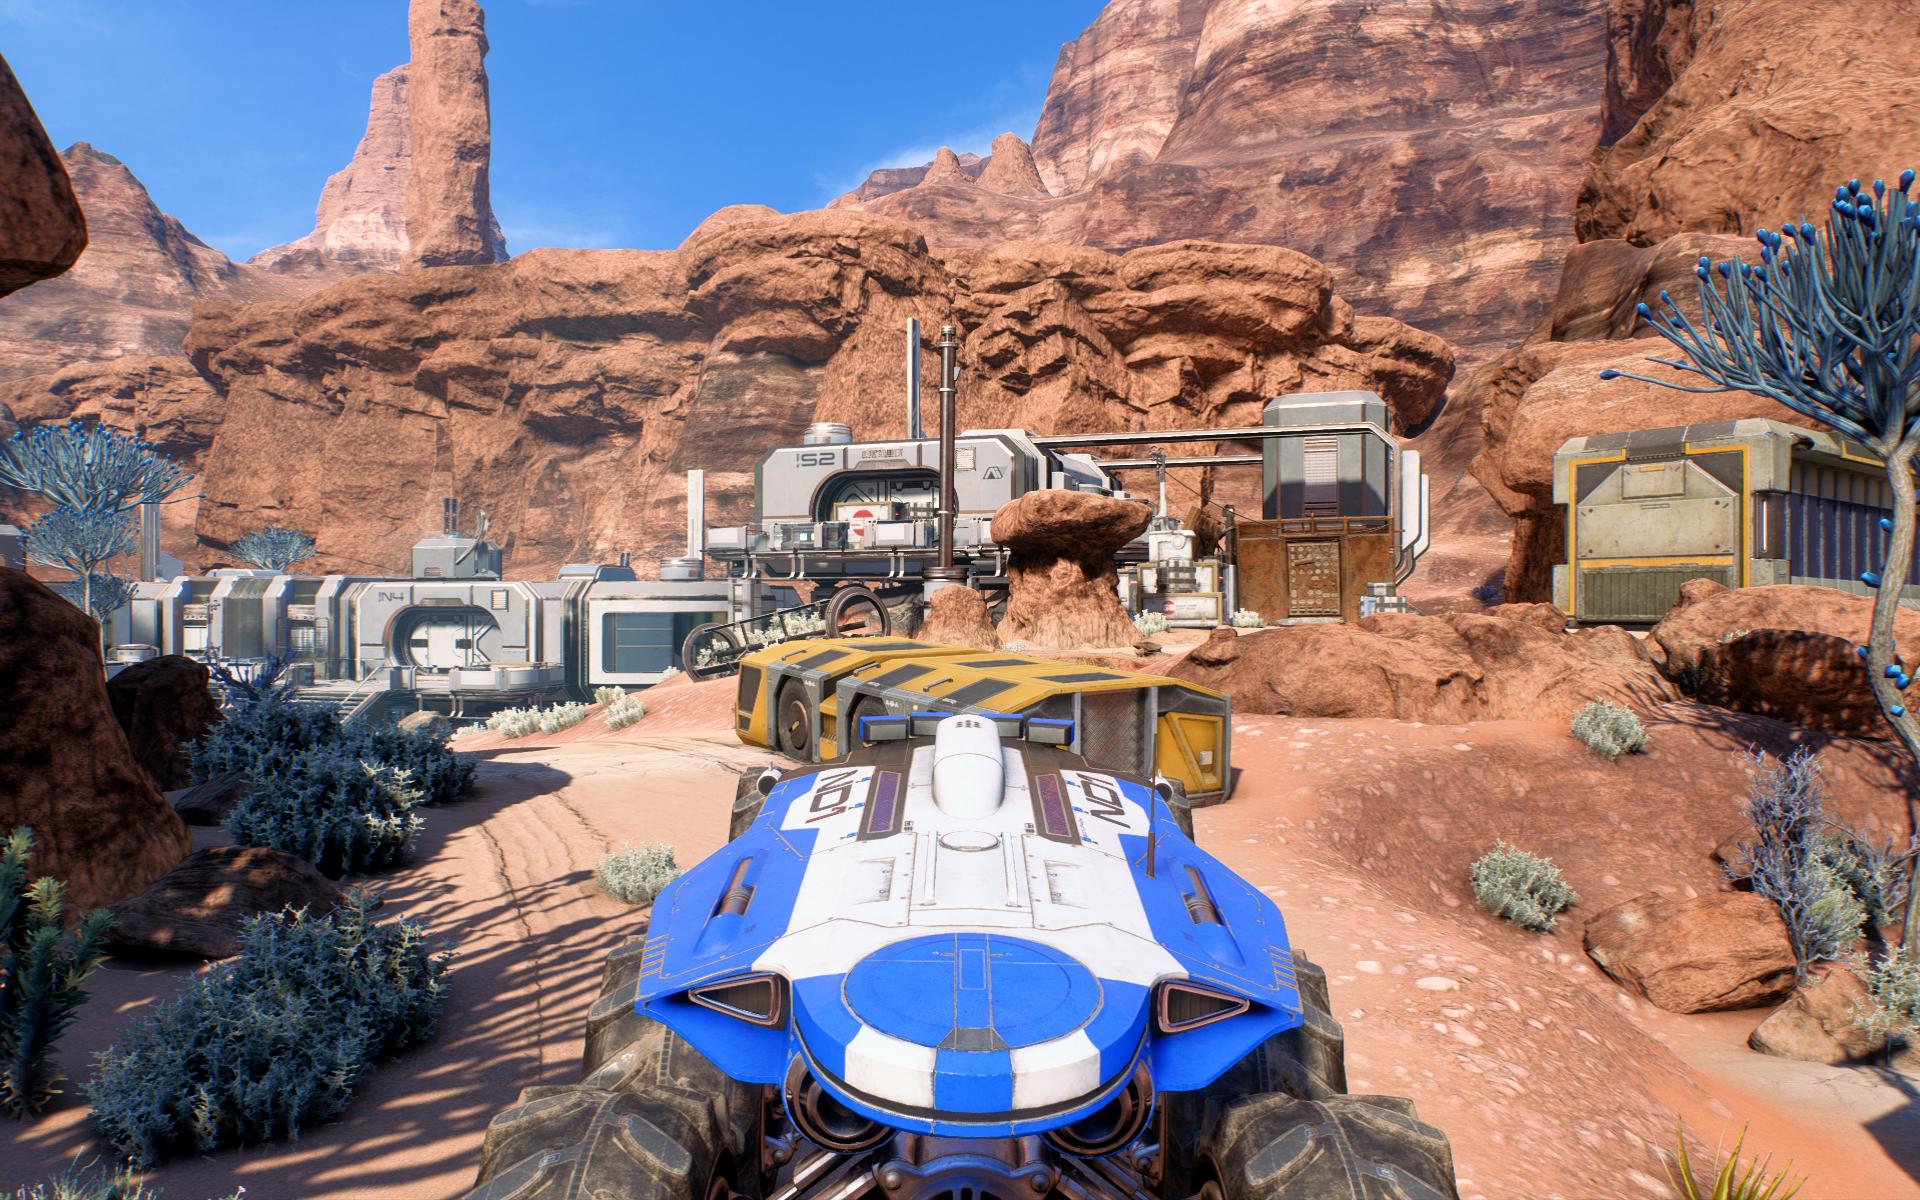 Mass Effect Andromeda Screenshot  - 06.24.21.44.png - Mass Effect: Andromeda